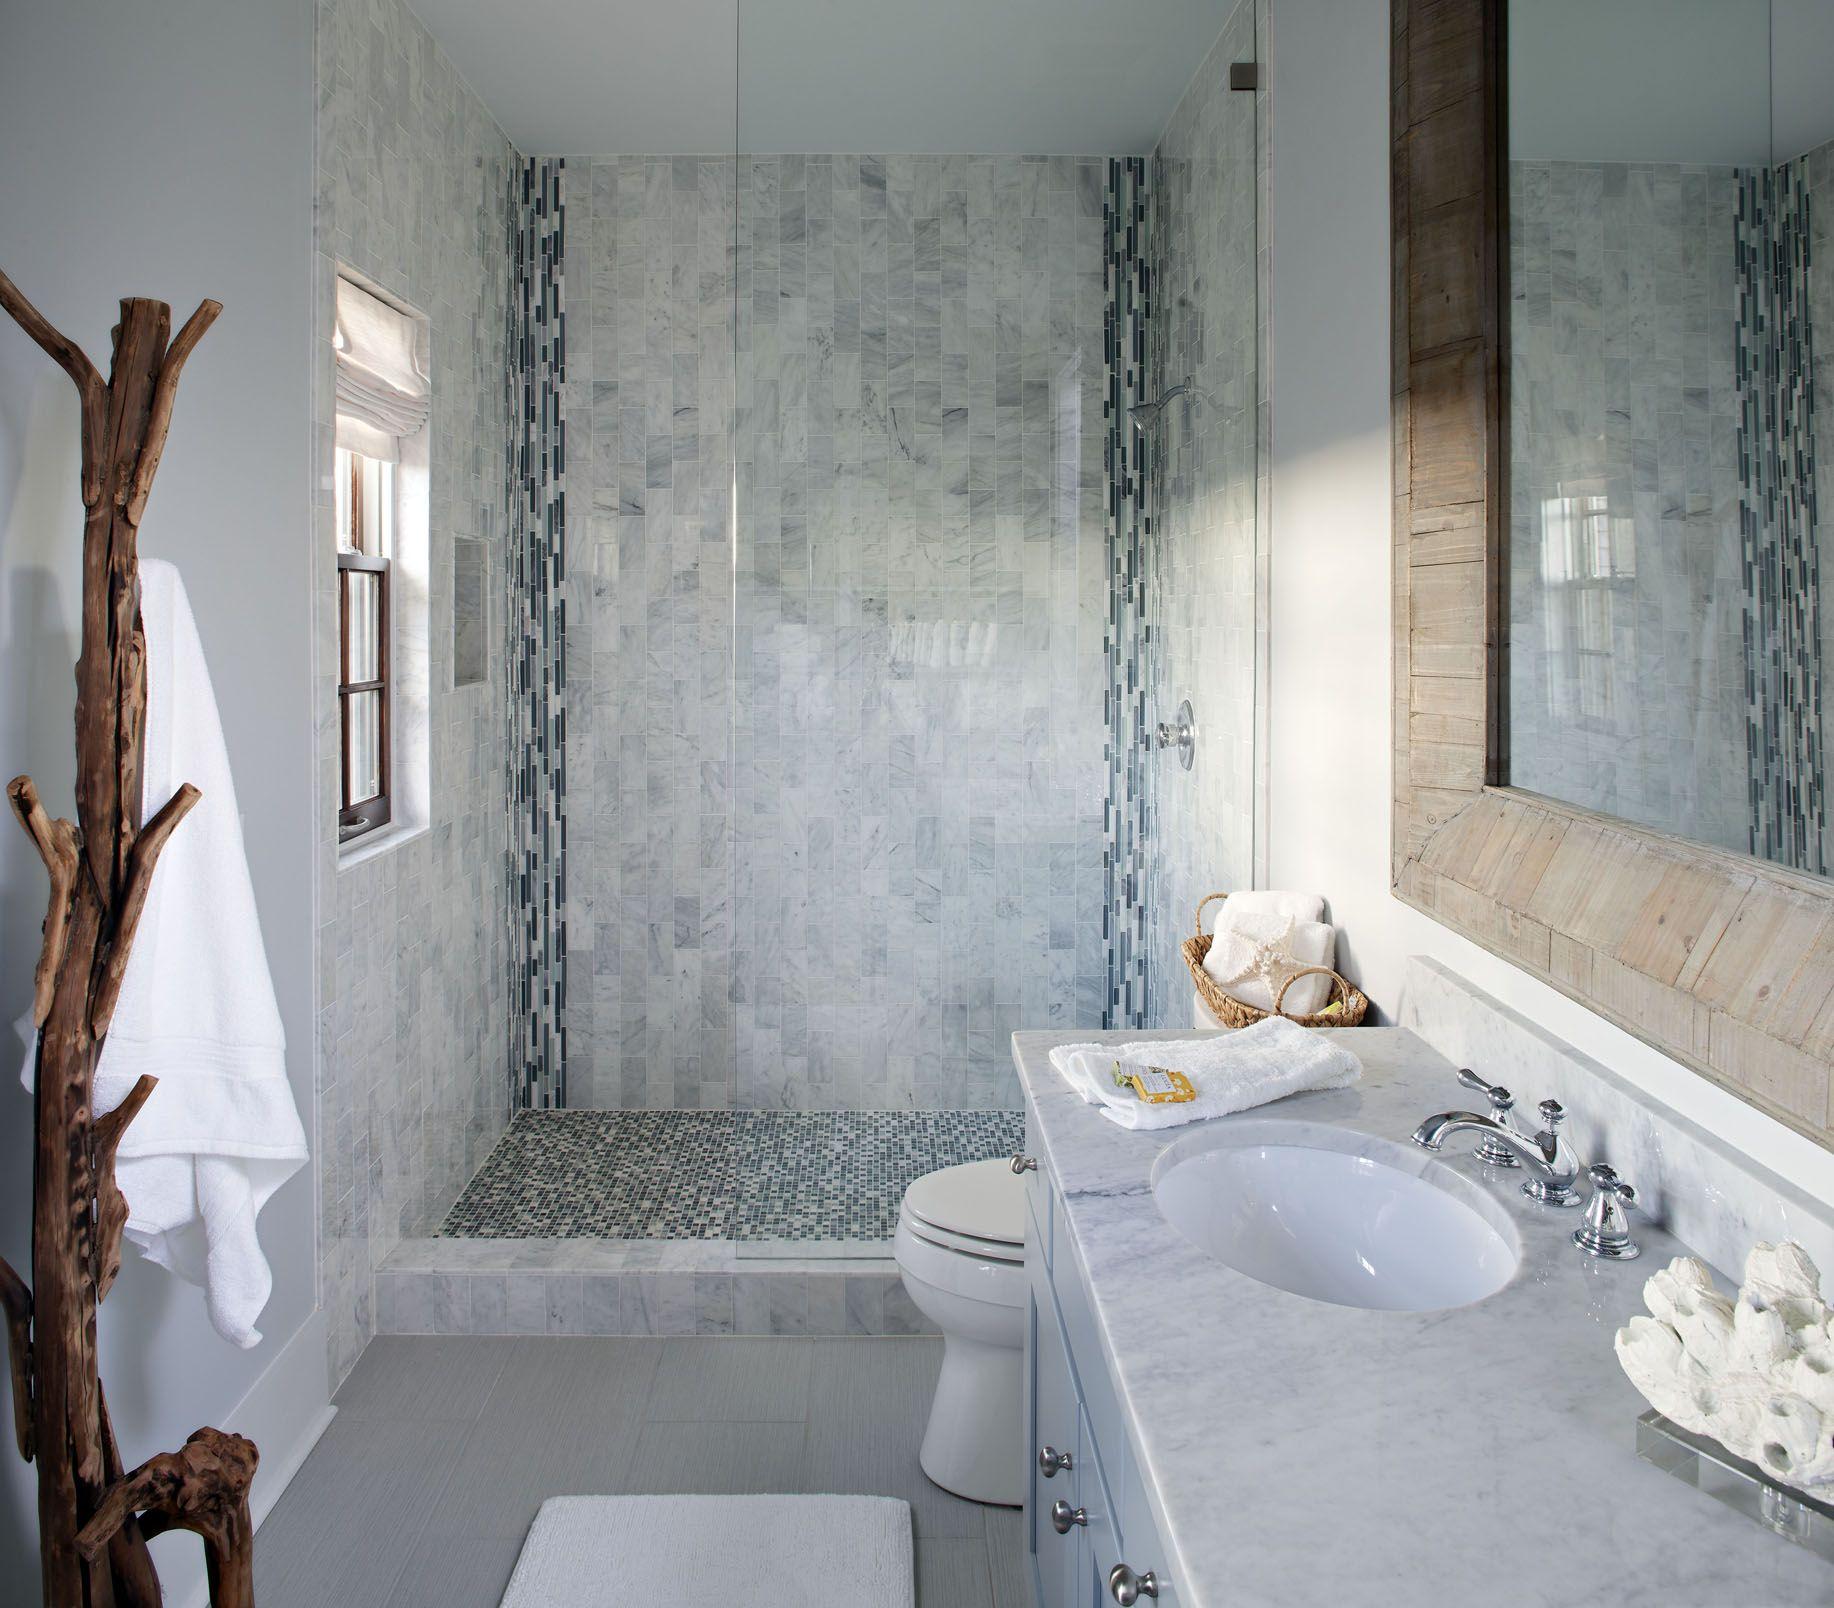 The tile shop design by kirsty georgian bathroom style - Grayton Beach Carriage House Summerhouse Interior Design Tile Showersshower Tilesopen